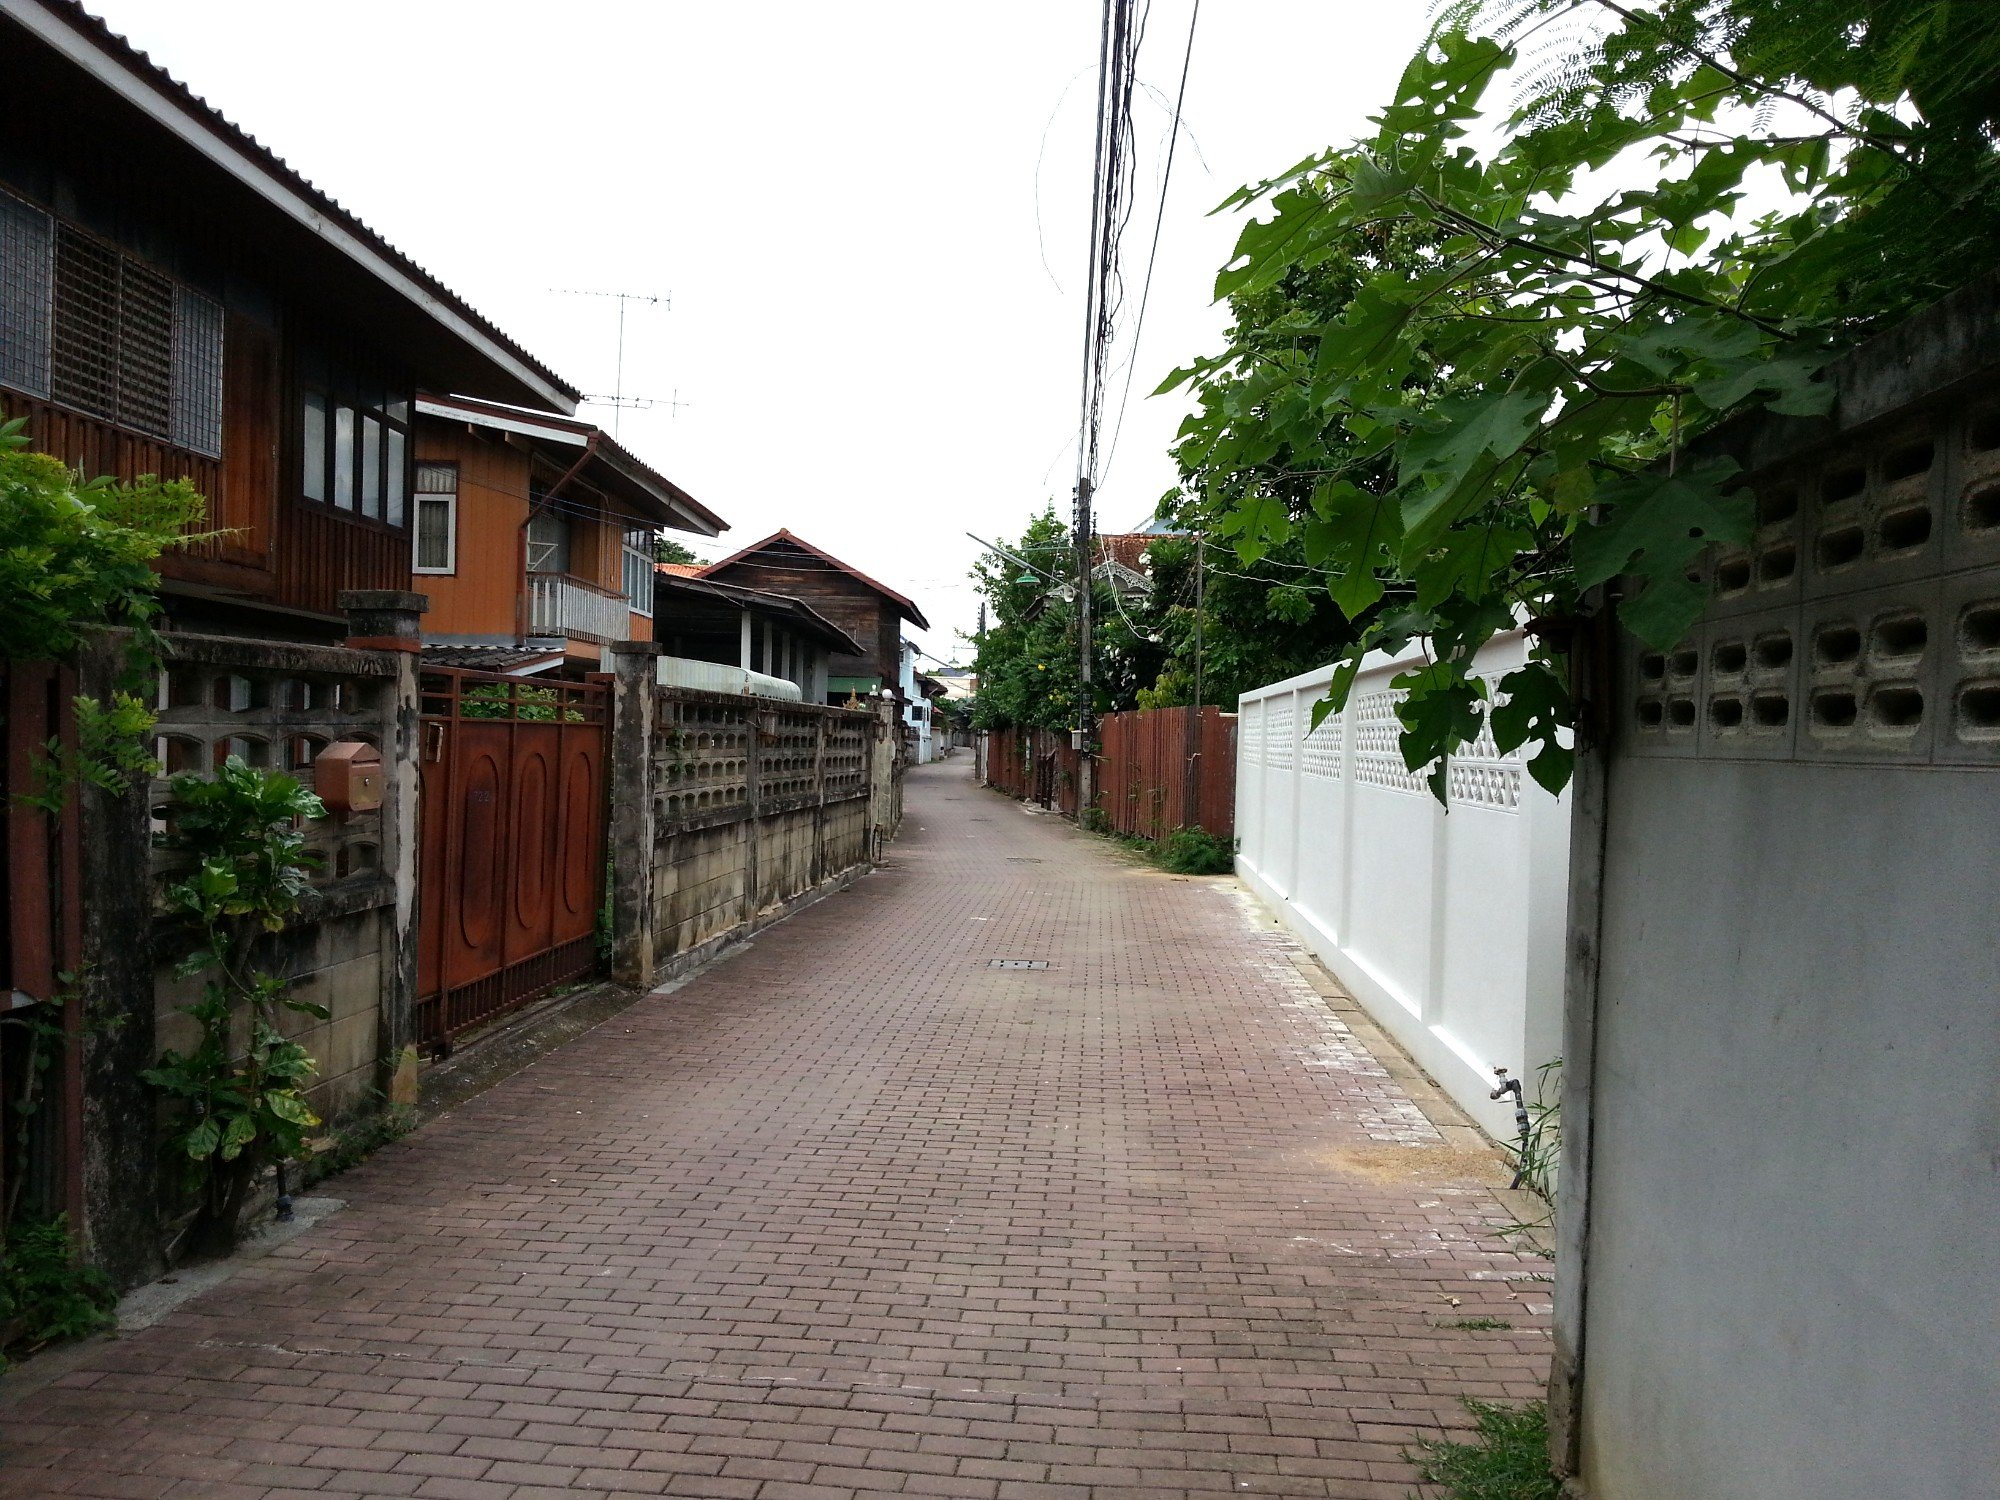 Ban Chin Alley is narrow